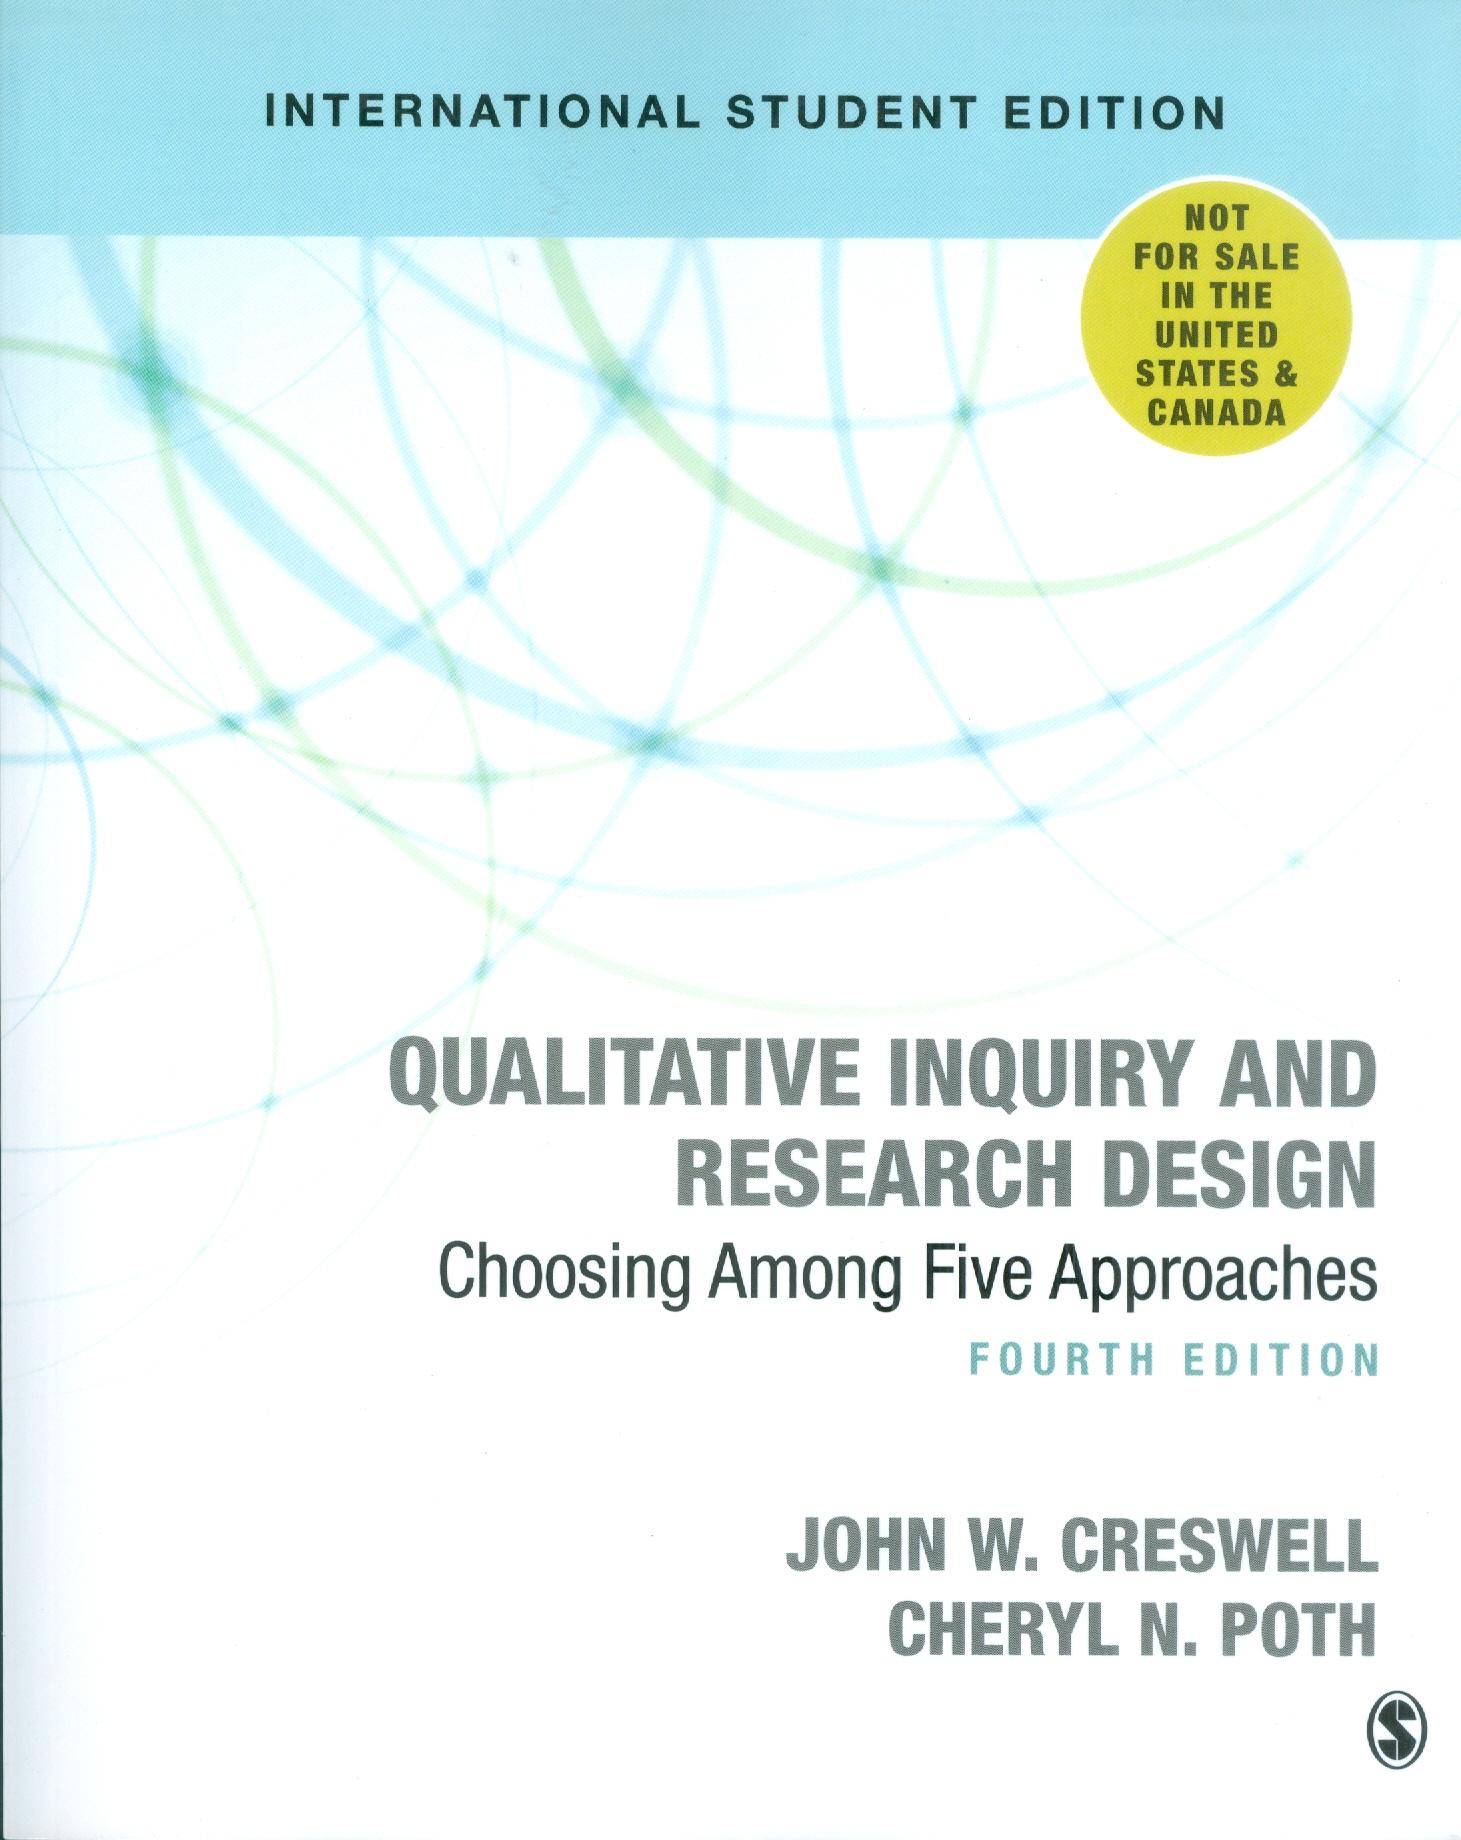 qualitative inquiry and research design0001.jpg